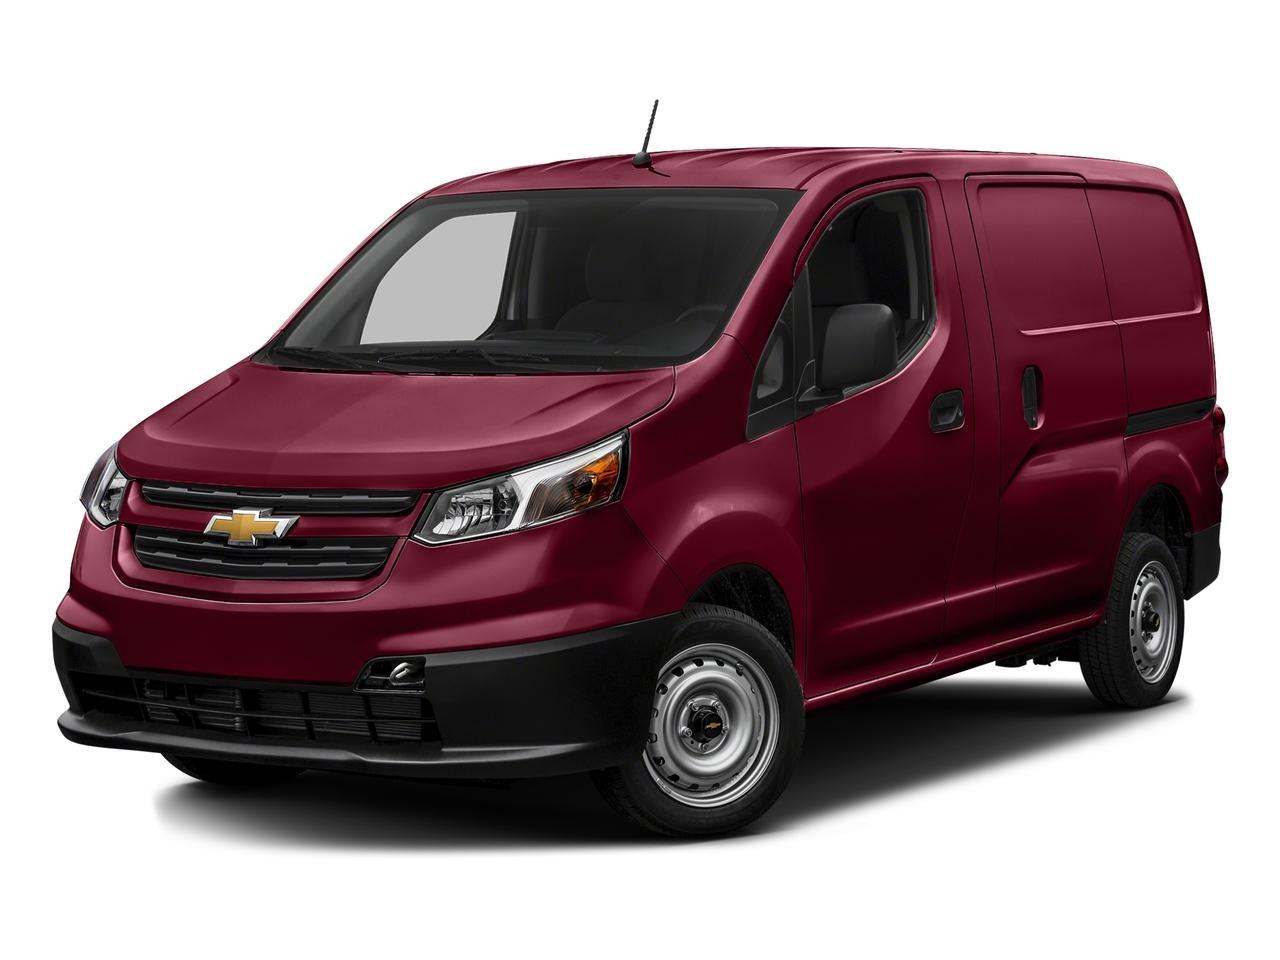 2017 Chevrolet City Express Cargo Van Vehicle Photo in Emporia, VA 23847